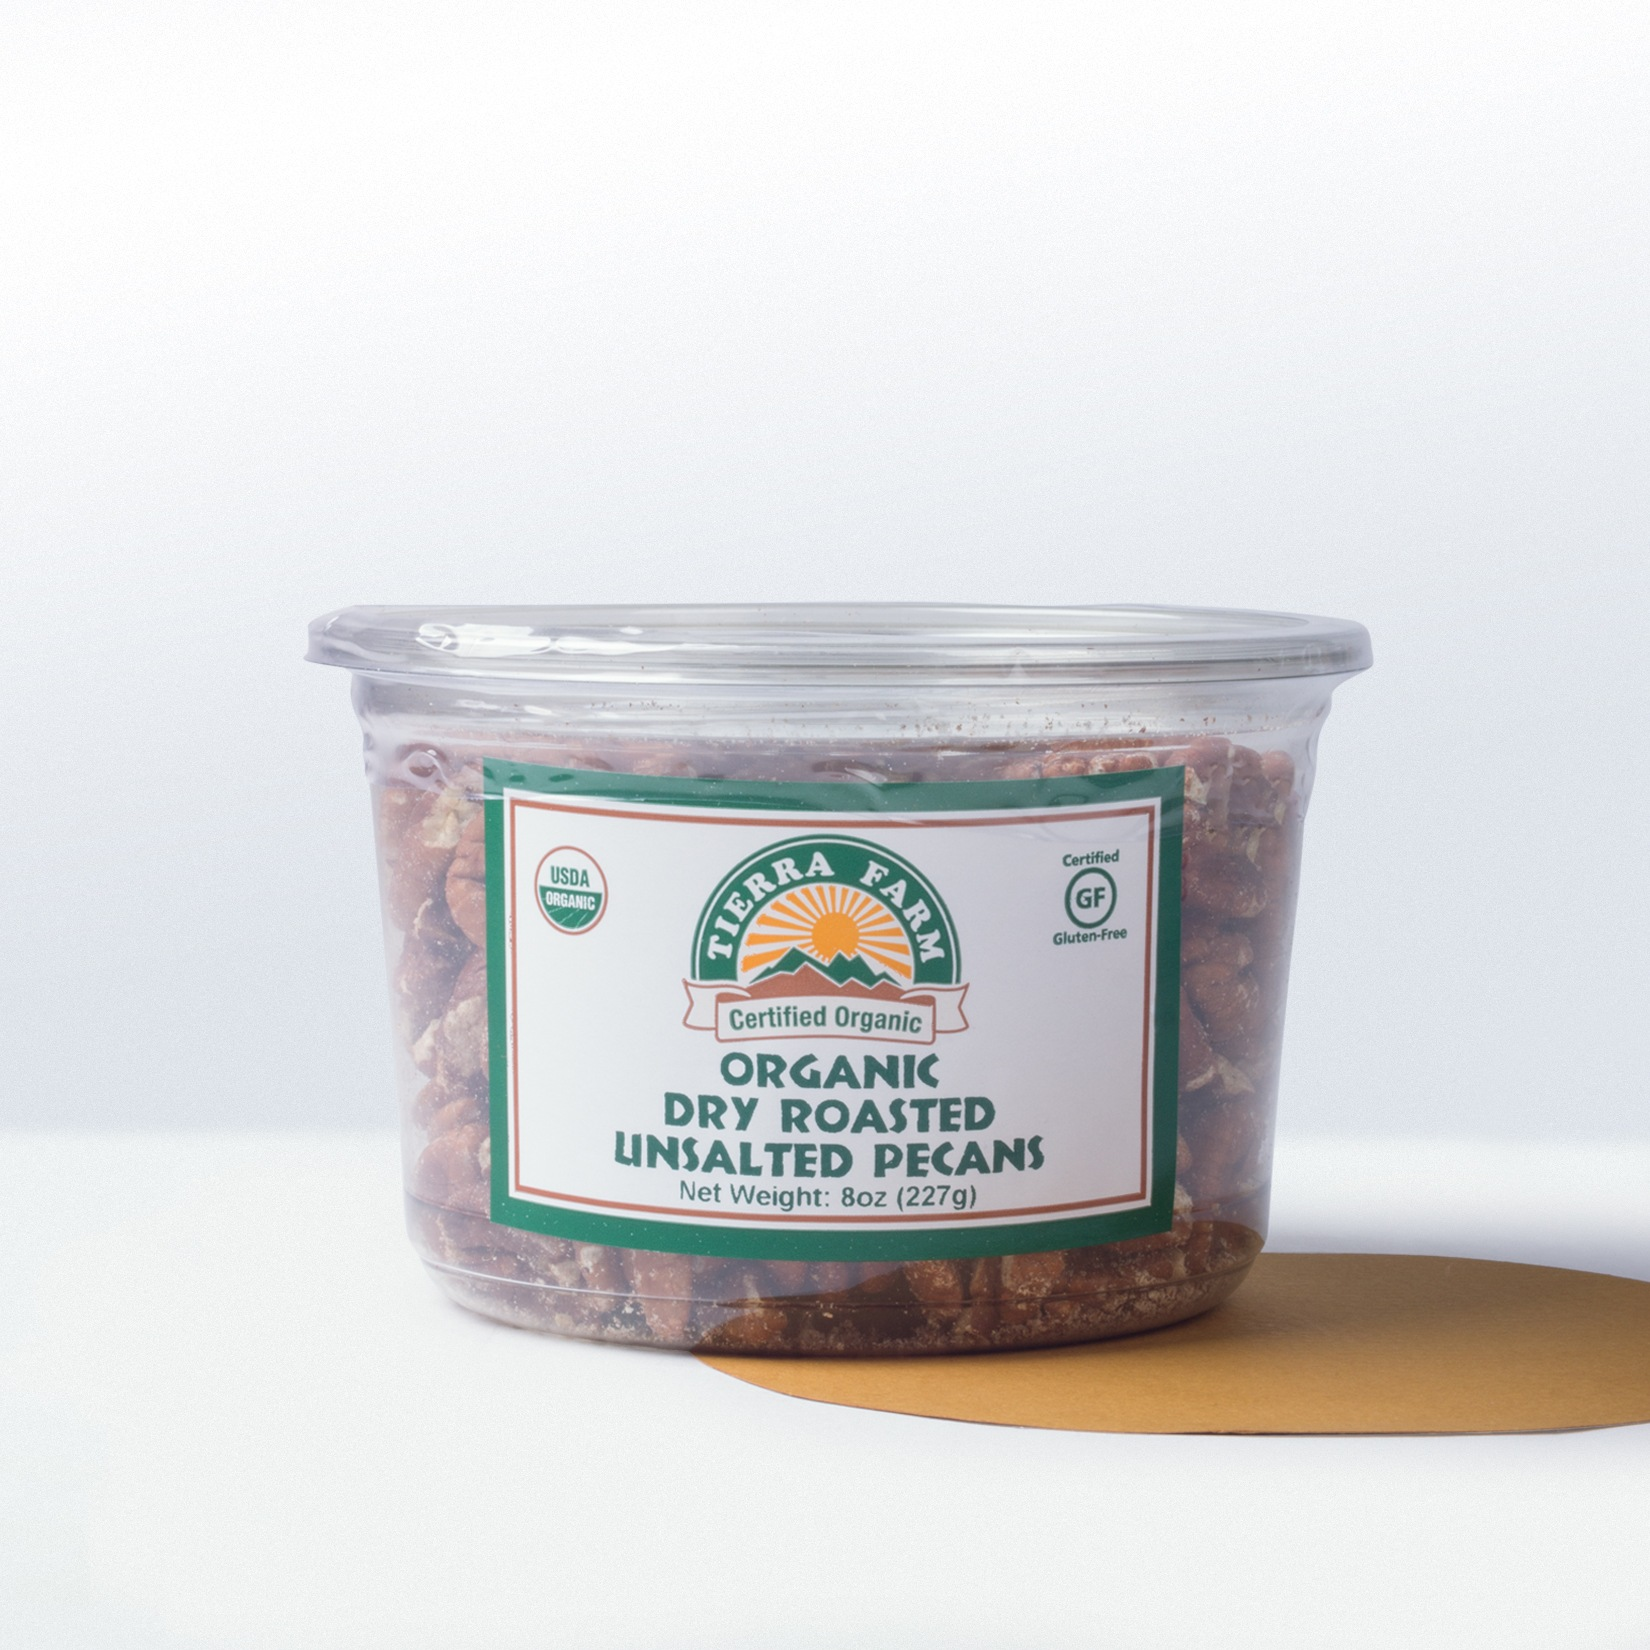 Tierra Farm-Organic Dry RoastedUnsalted Pecans